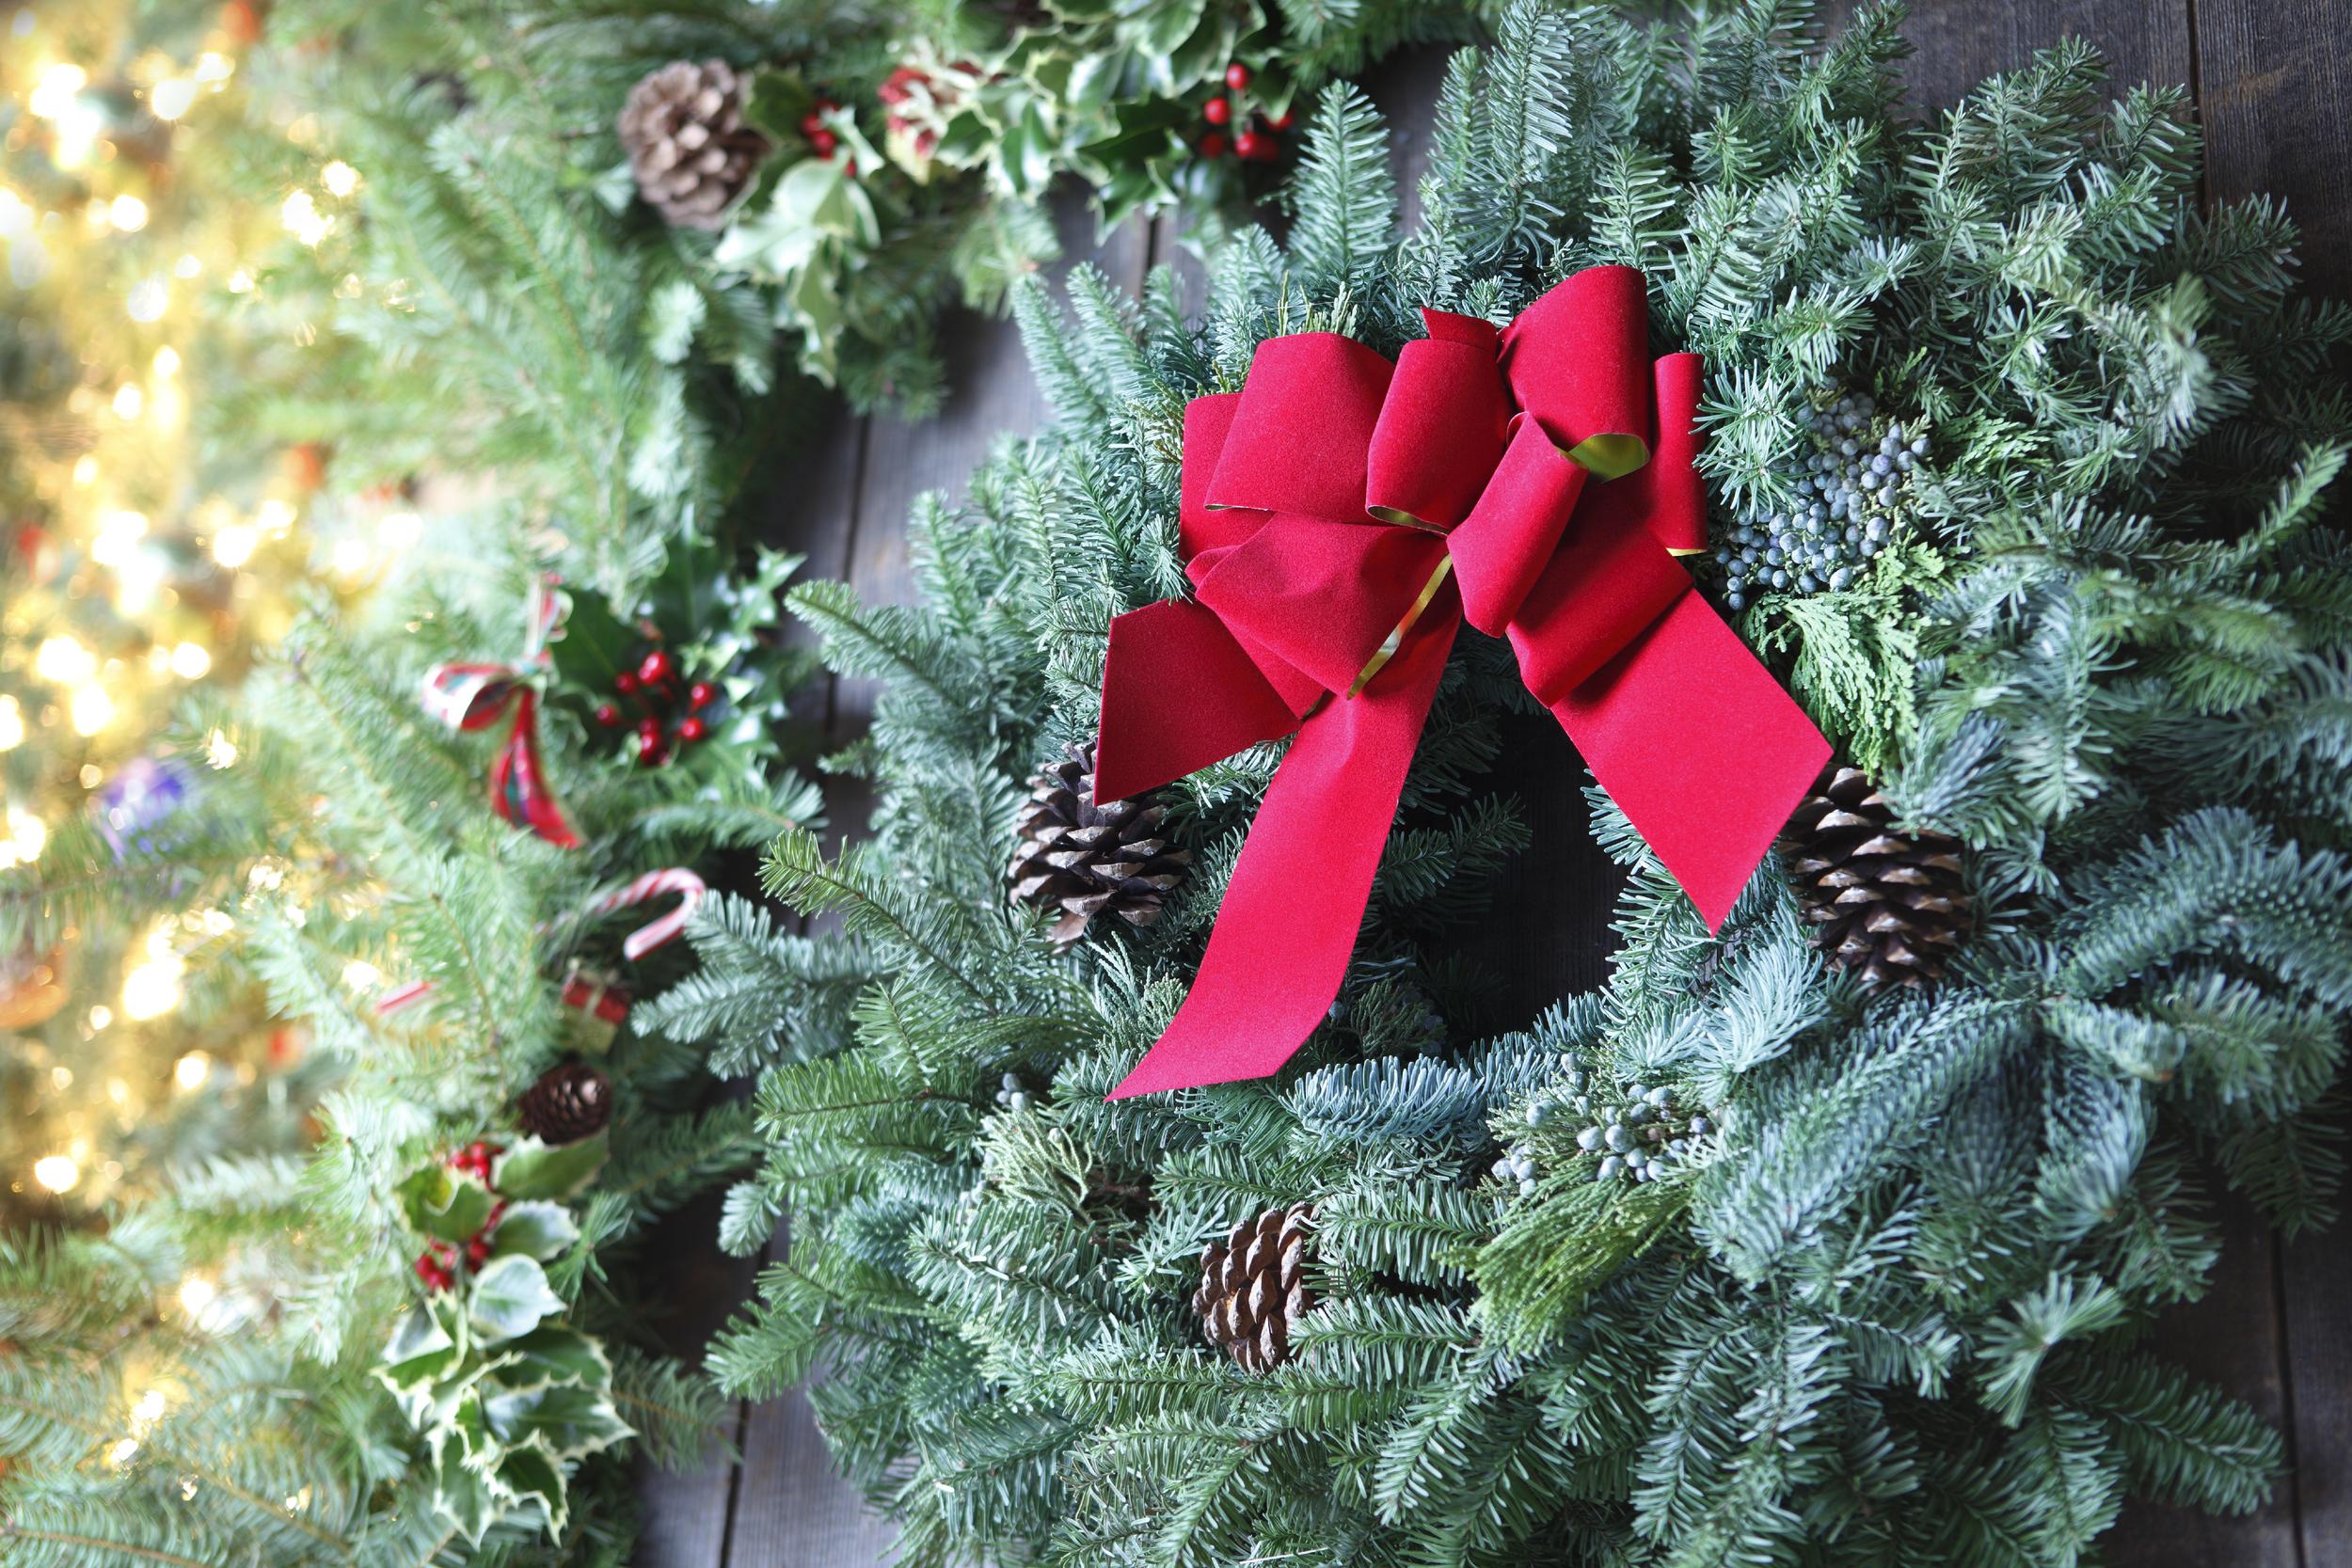 Holiday Christmas Wreath 18413370_Full.jpg